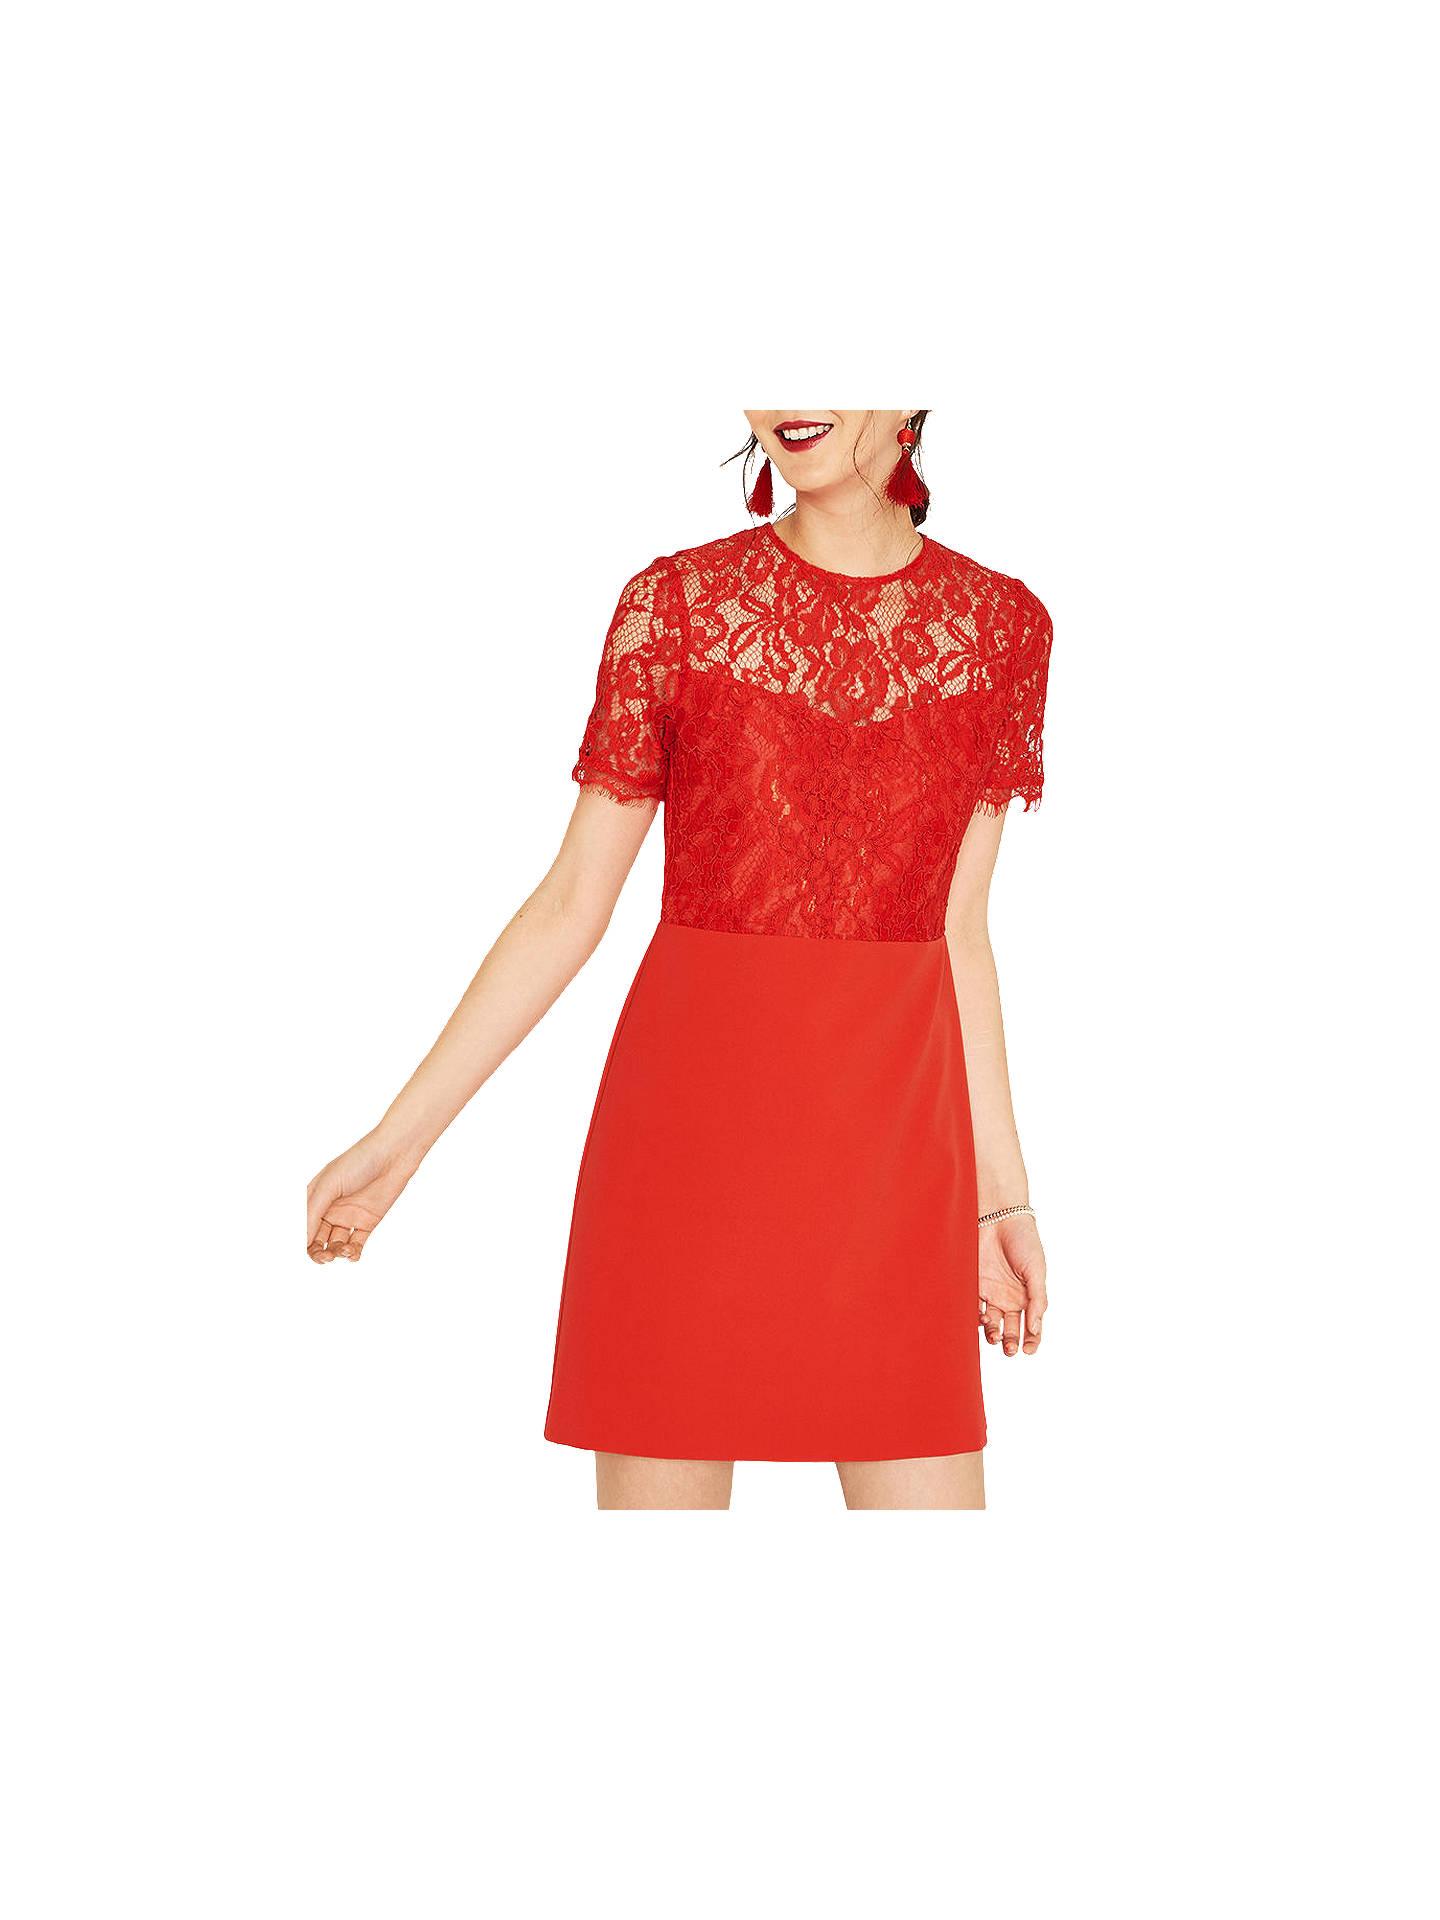 0a70d8222076 Buy Oasis Lace Bodice Dress, Mid Orange, 6 Online at johnlewis.com ...